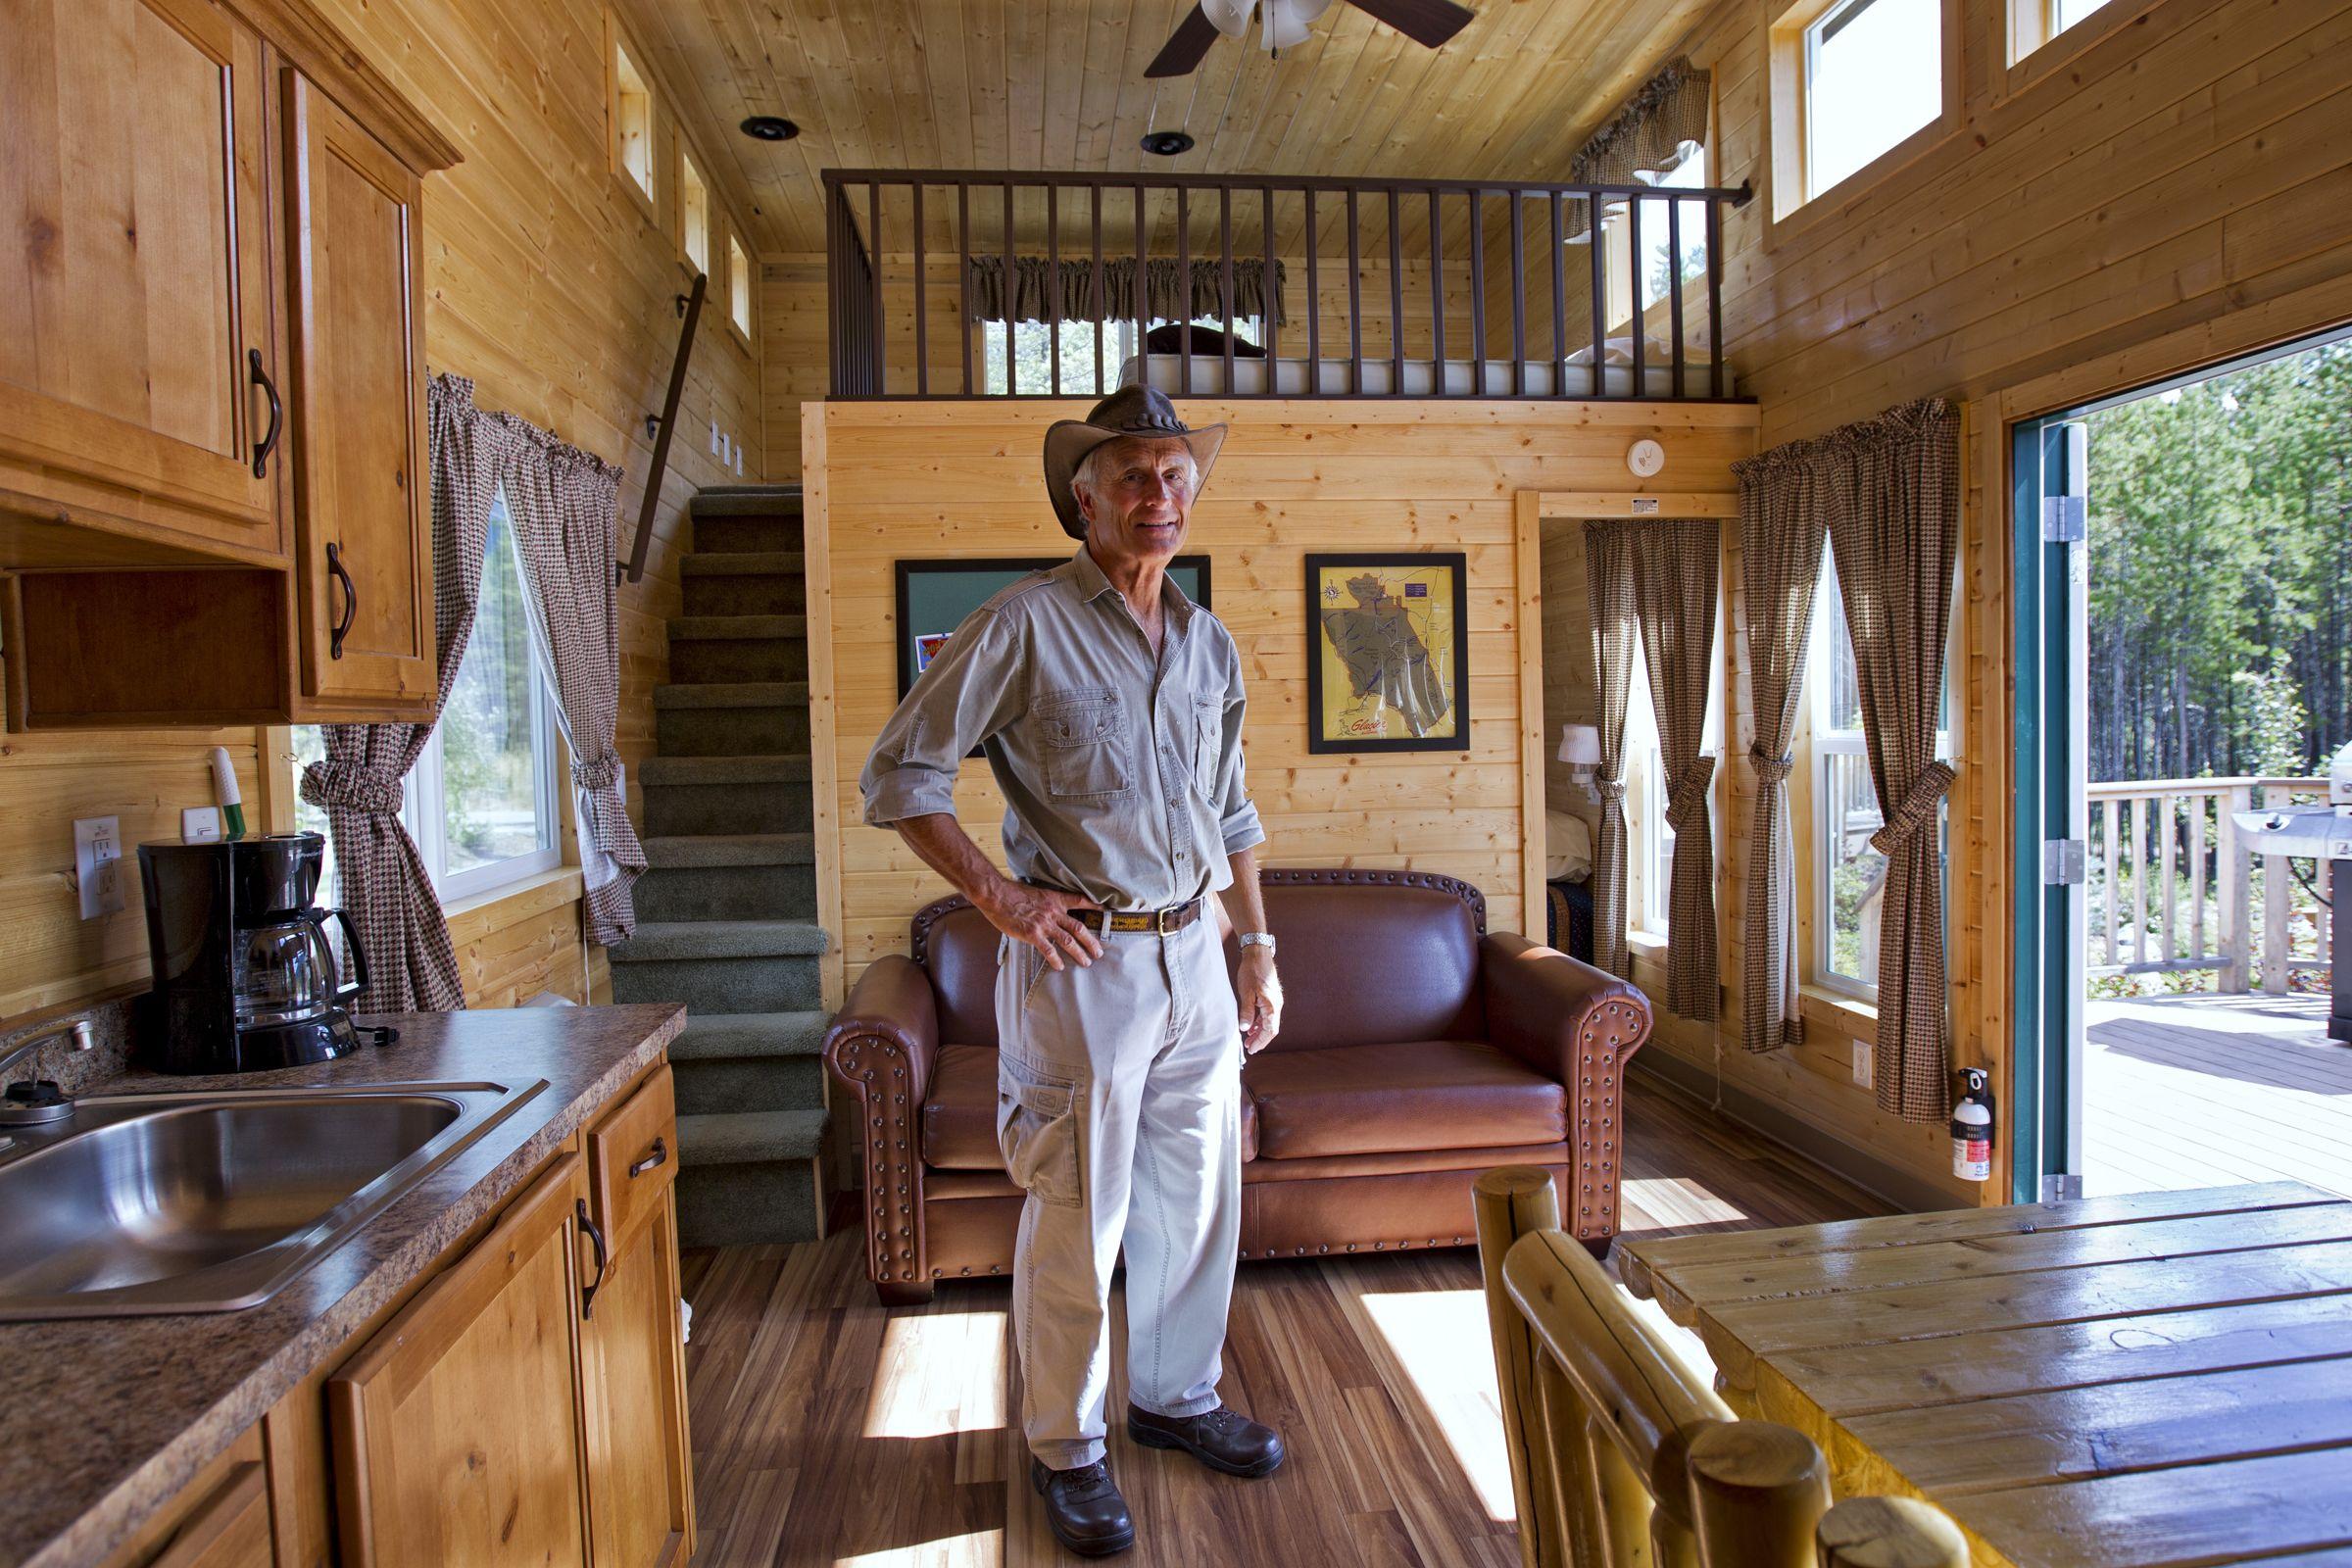 Lofted Barn Cabin Interiors Stairs